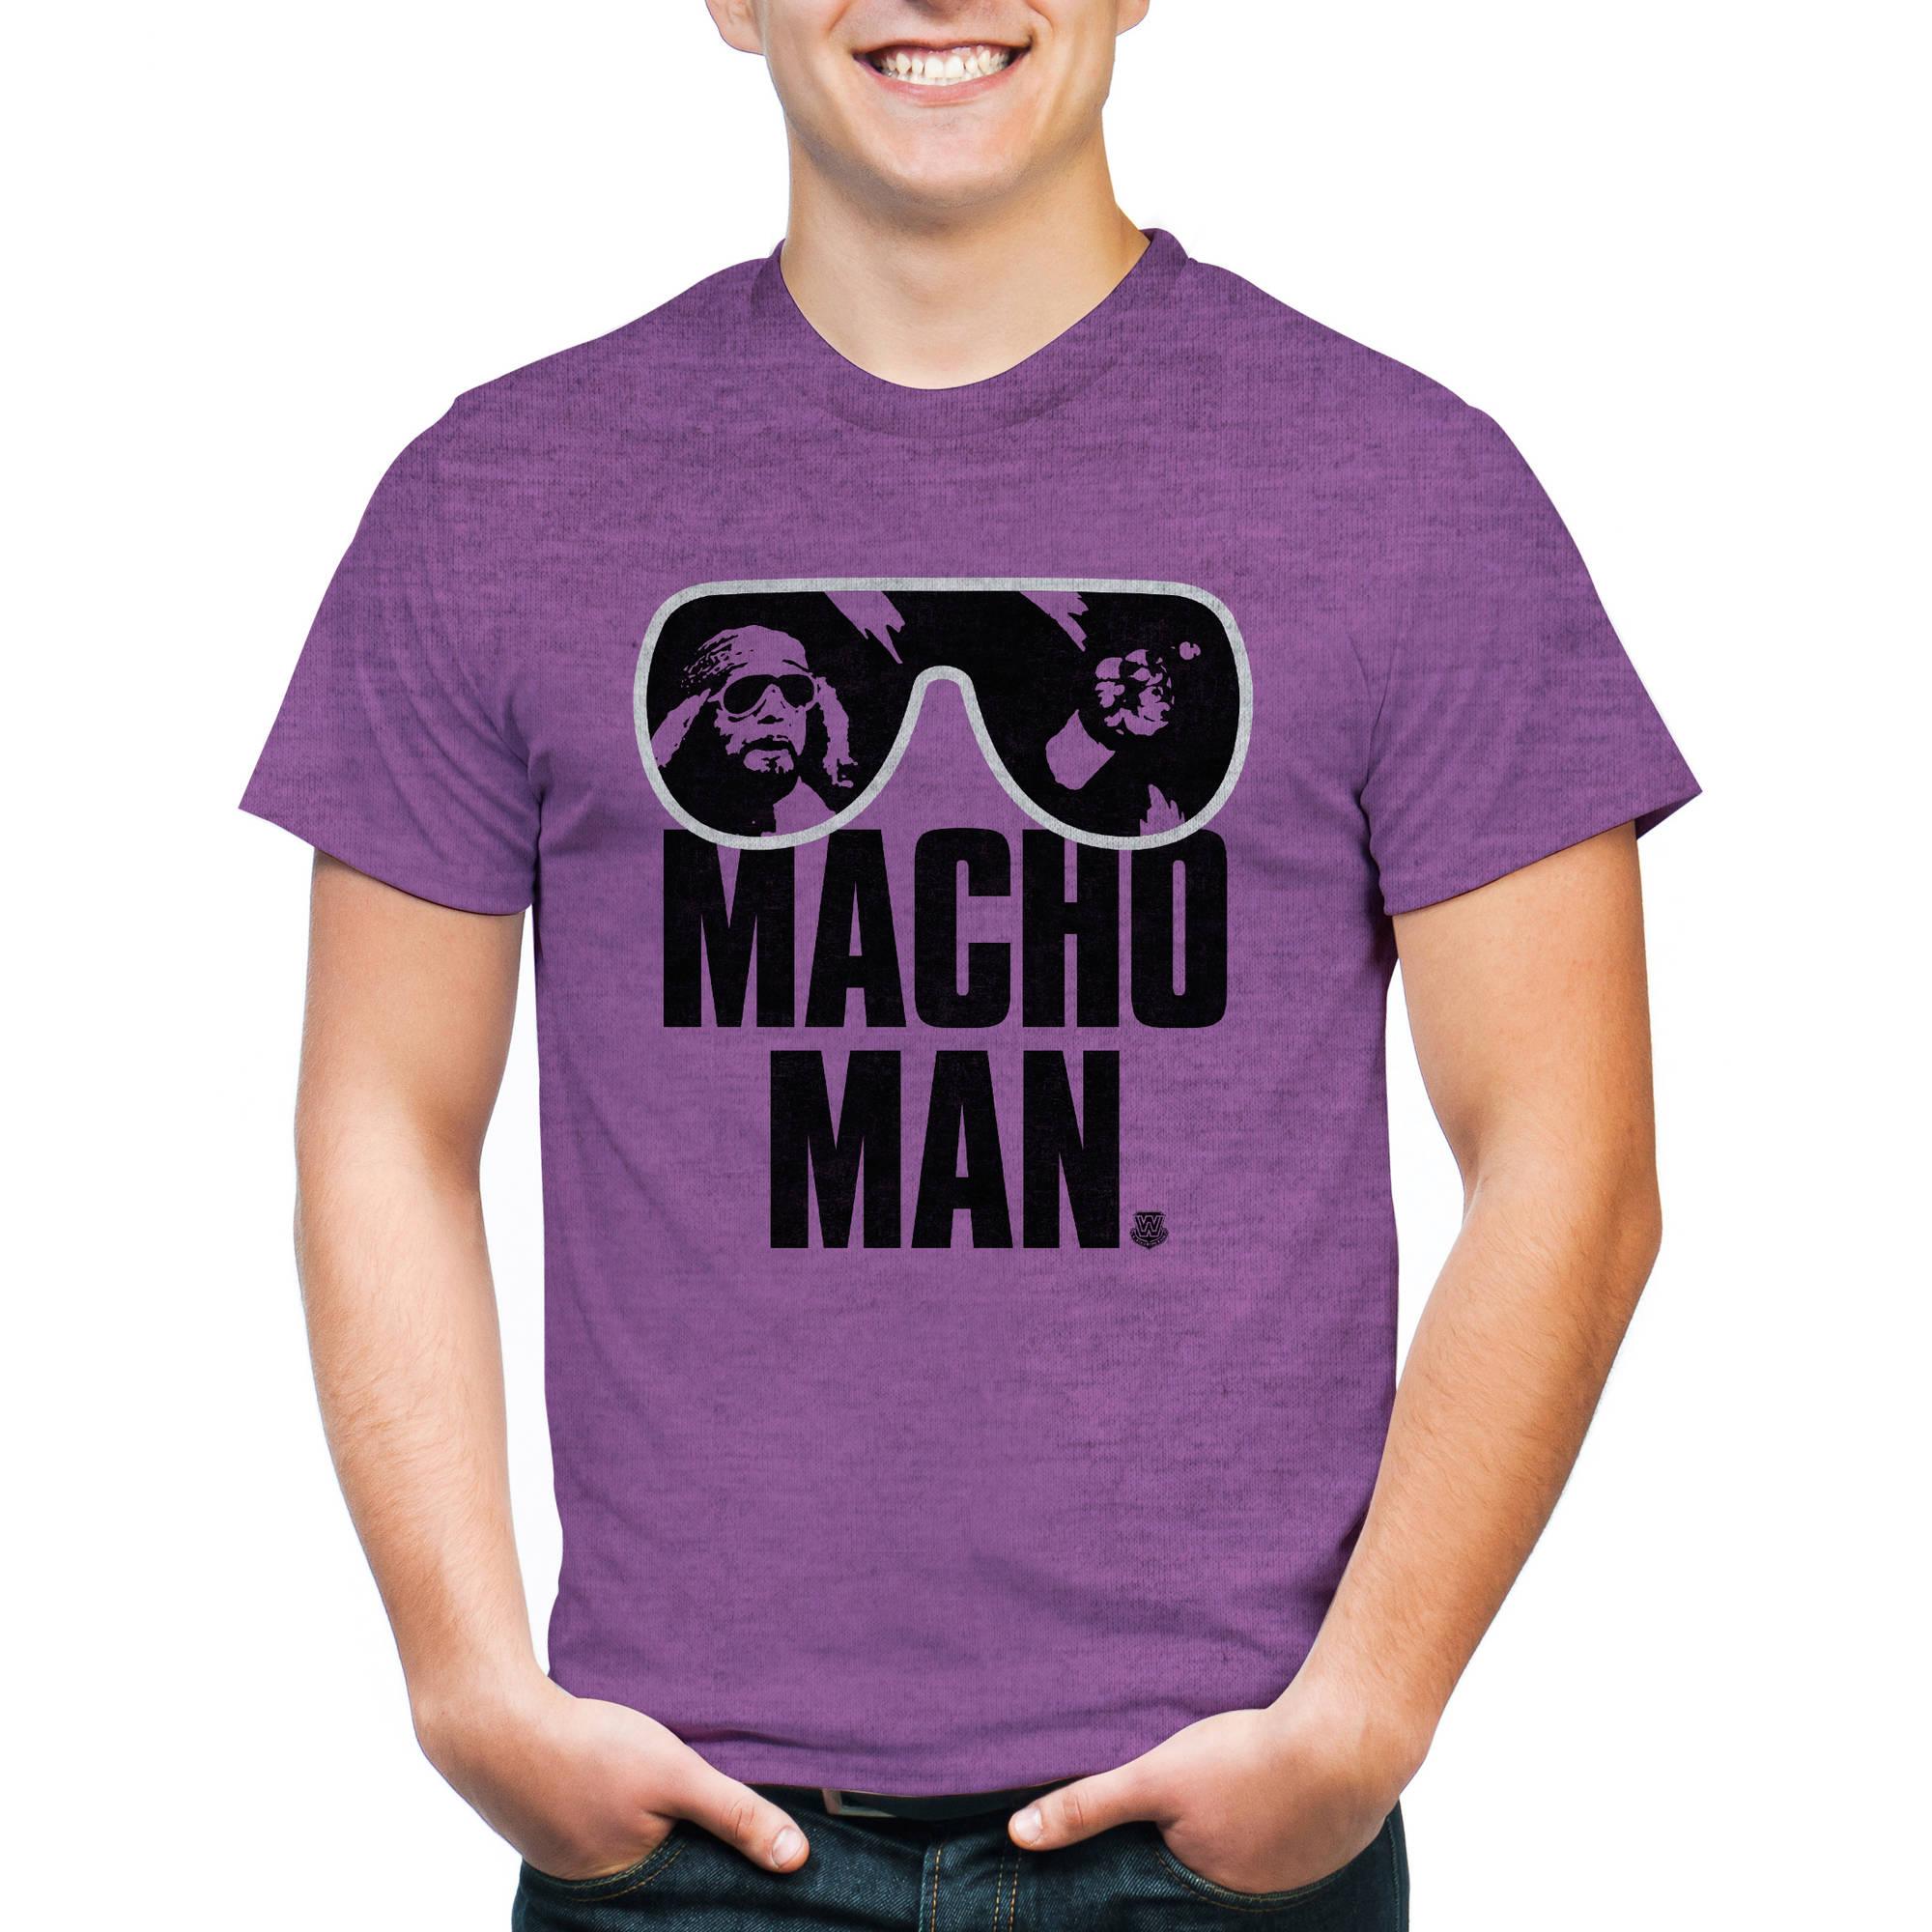 WWE Macho Man Authentic Men's Graphic Short Sleeve T-Shirt, 2XL